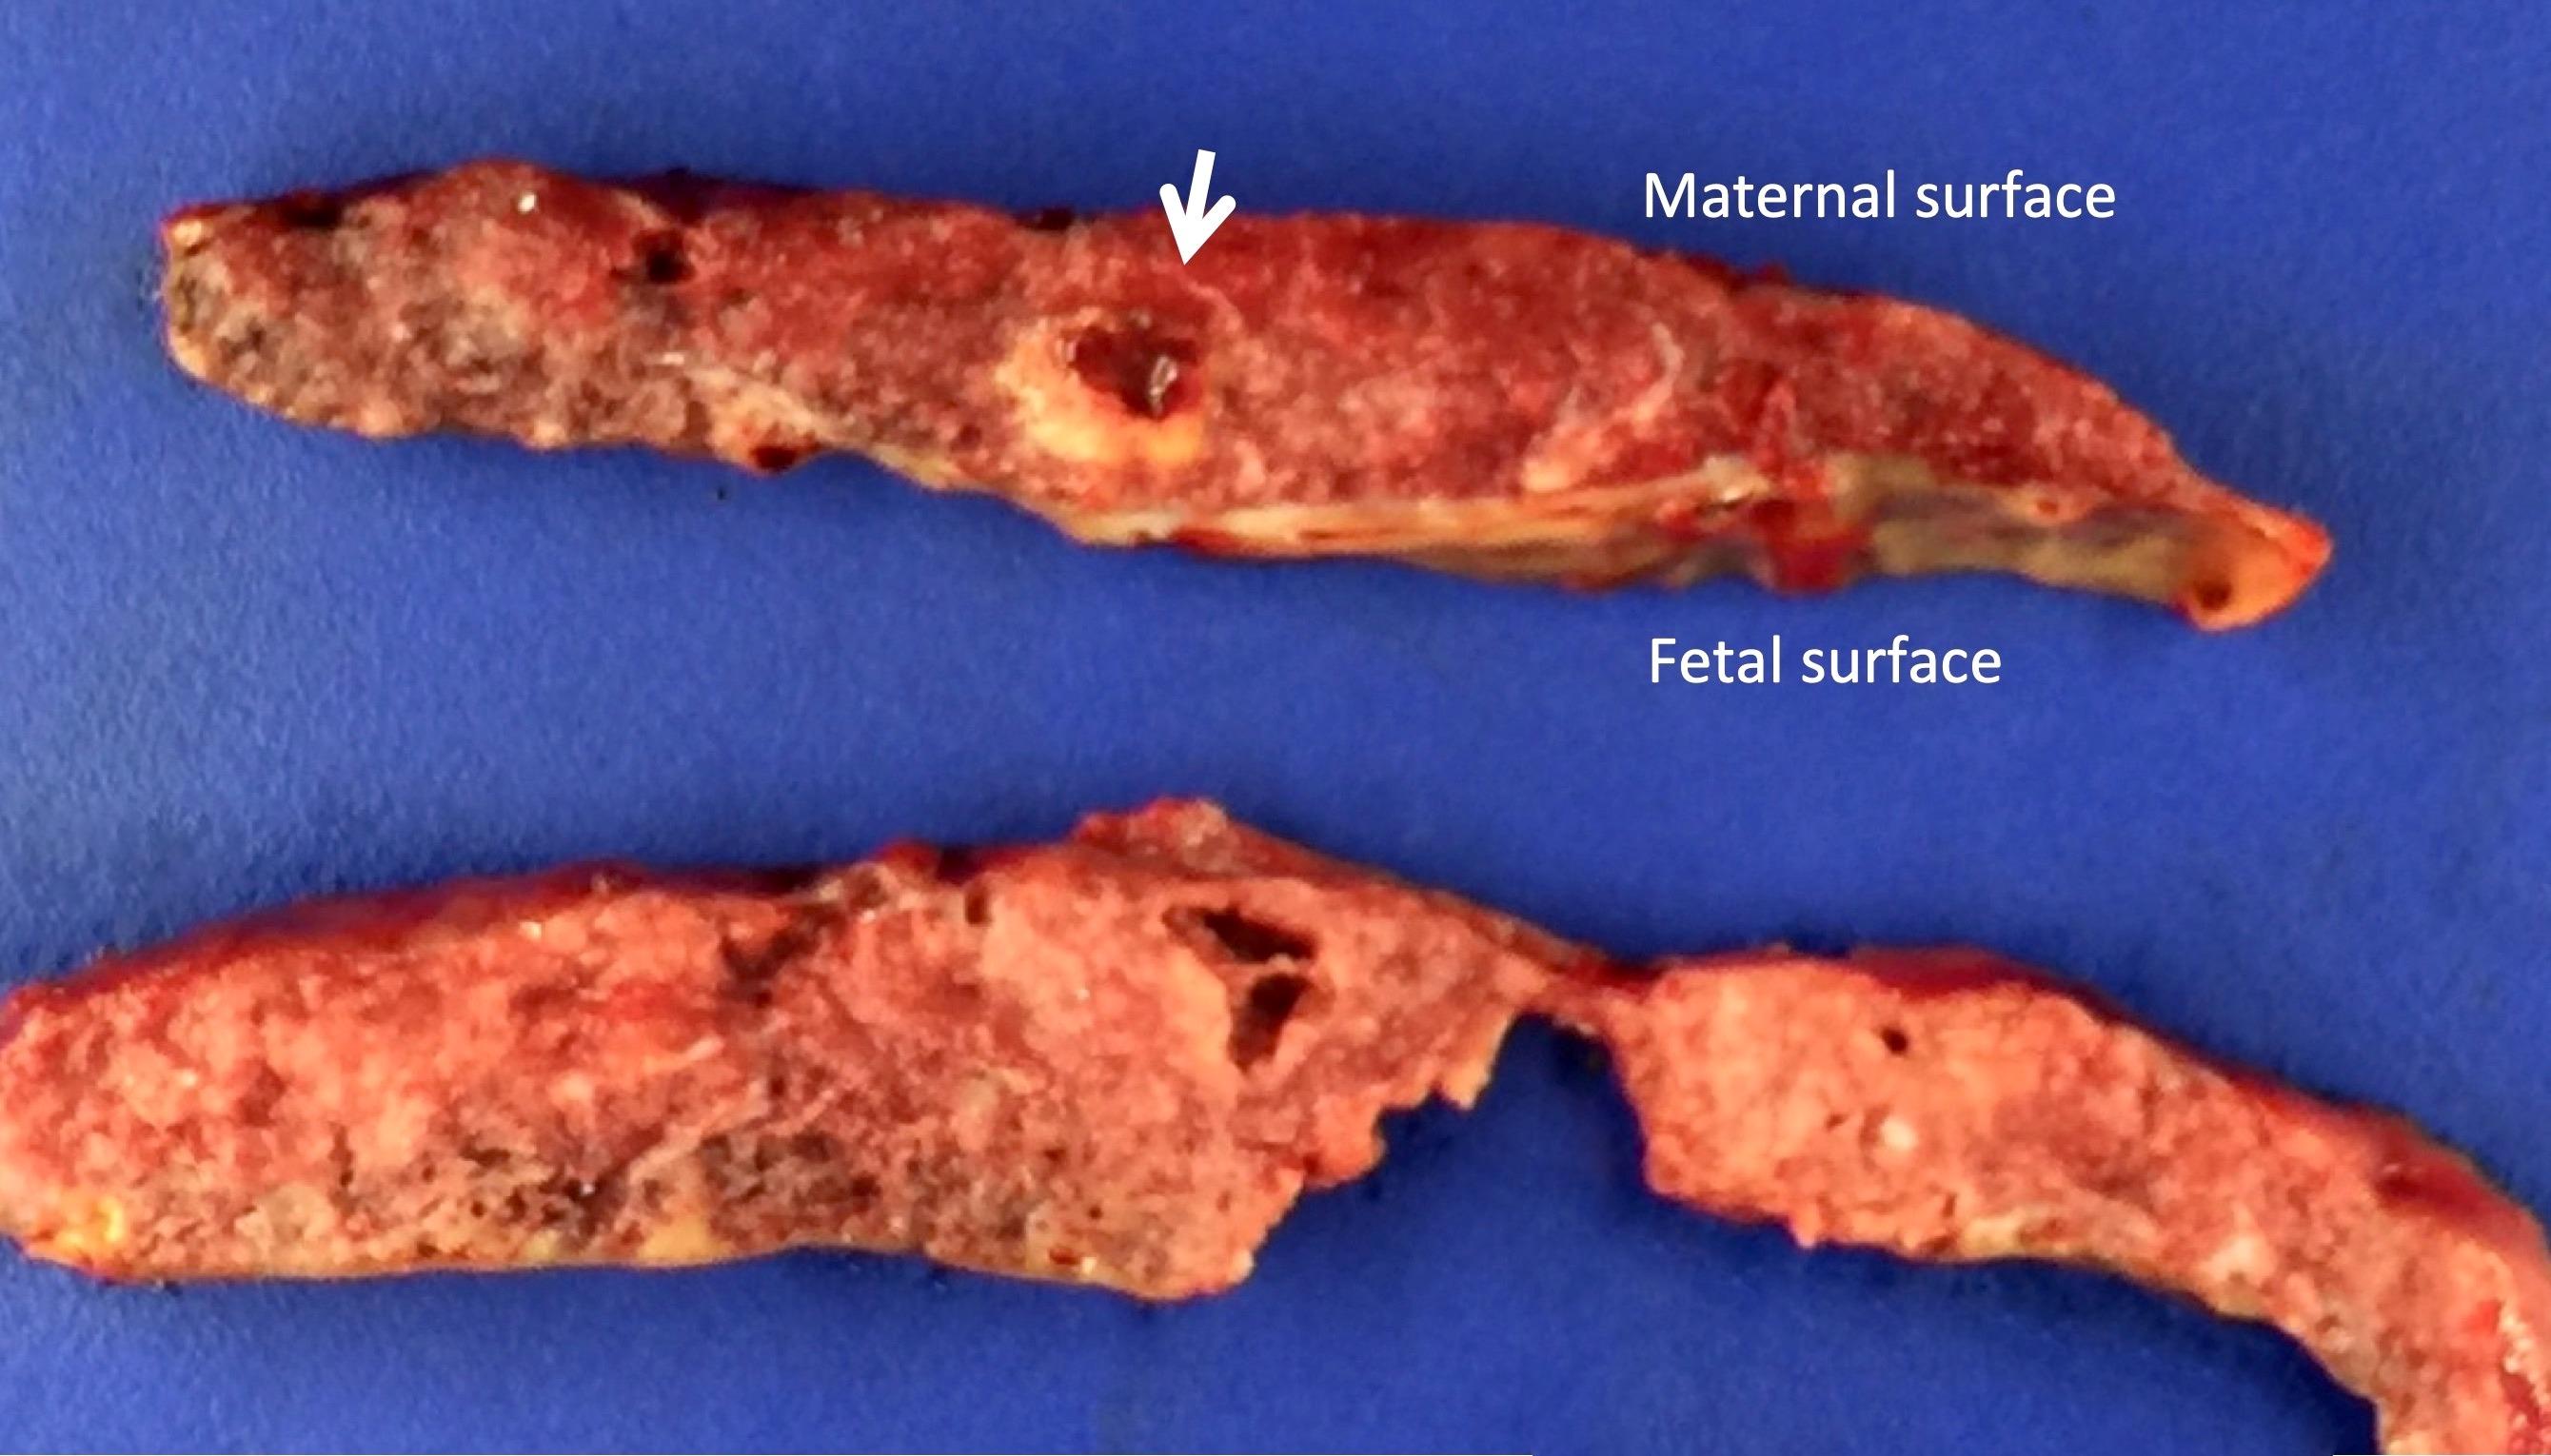 Infarction hematoma